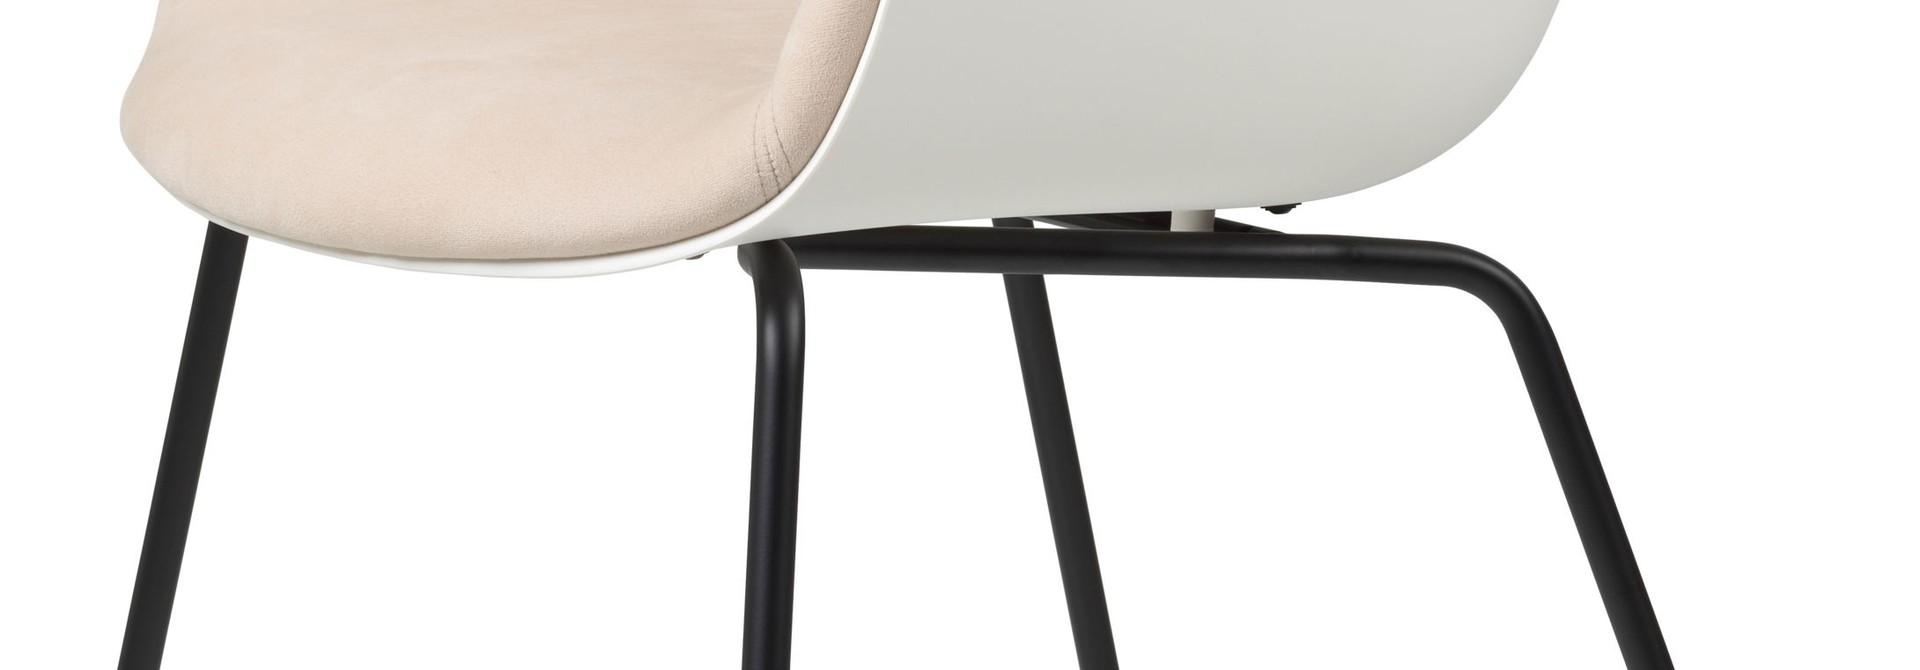 Bat Chair Half Gestoffeerd - Brass / Black - Vanaf € 619.00